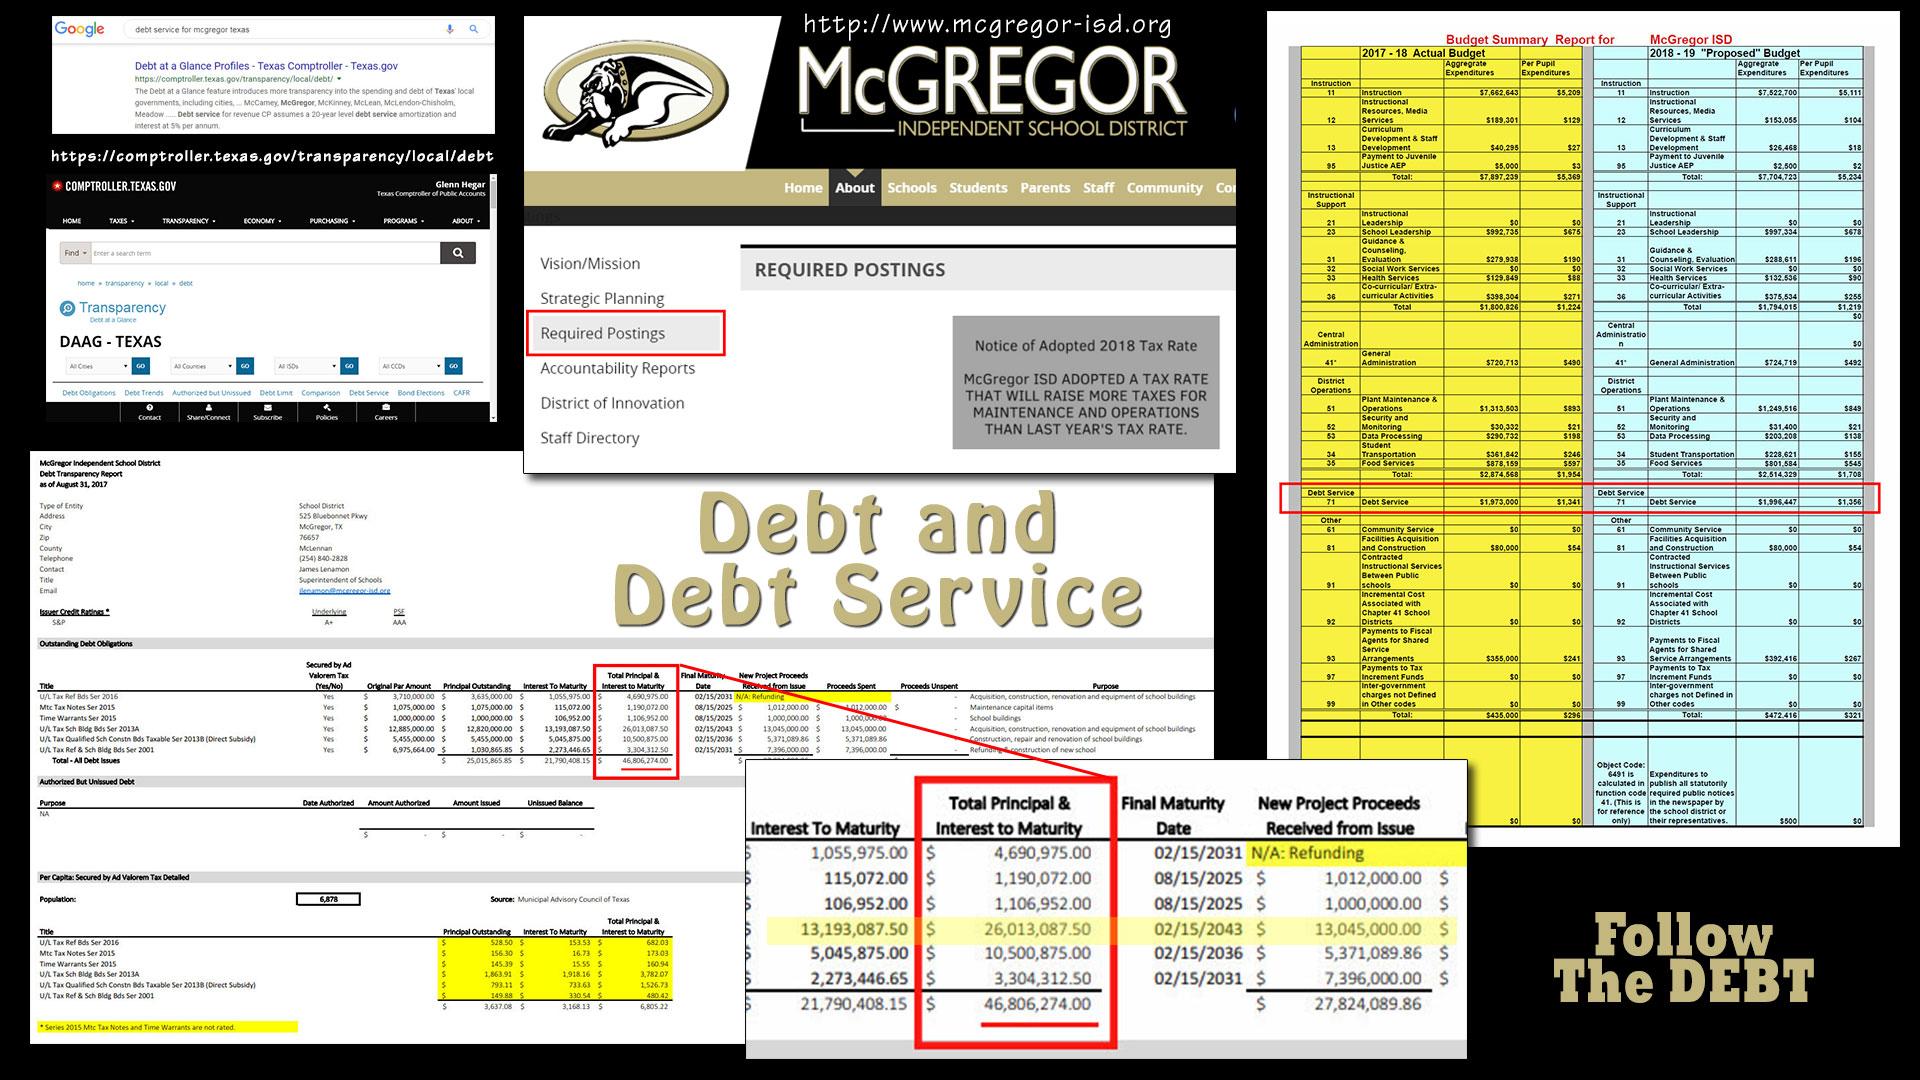 MISD_DebtandDebt_Service